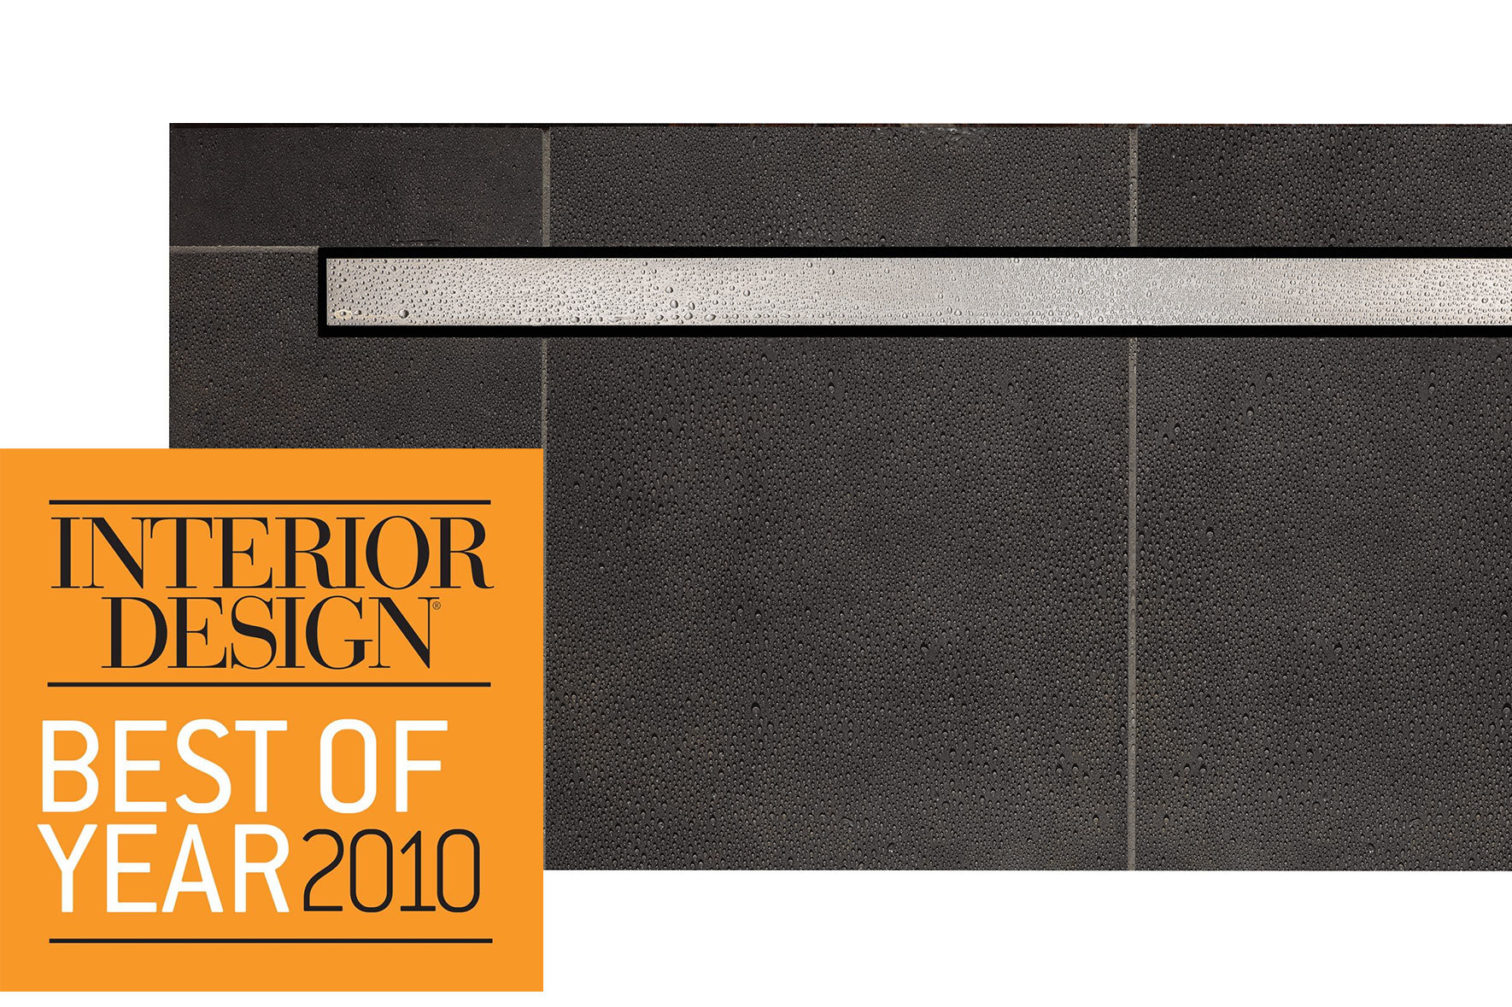 Interior Design Best of Year logo overlay on Ceraline drain